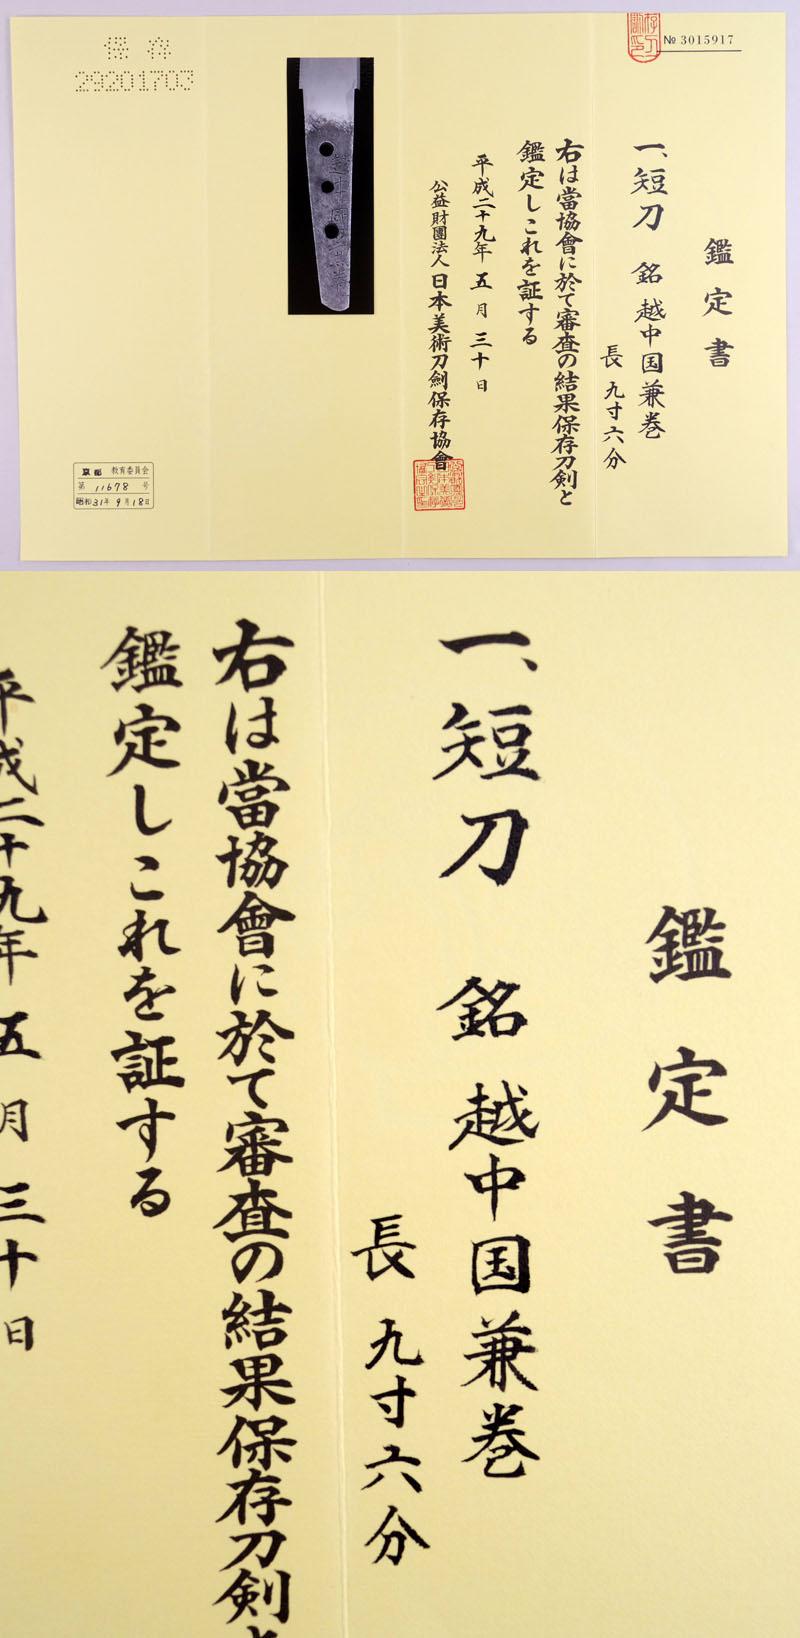 越中国兼巻 Picture of Certificate